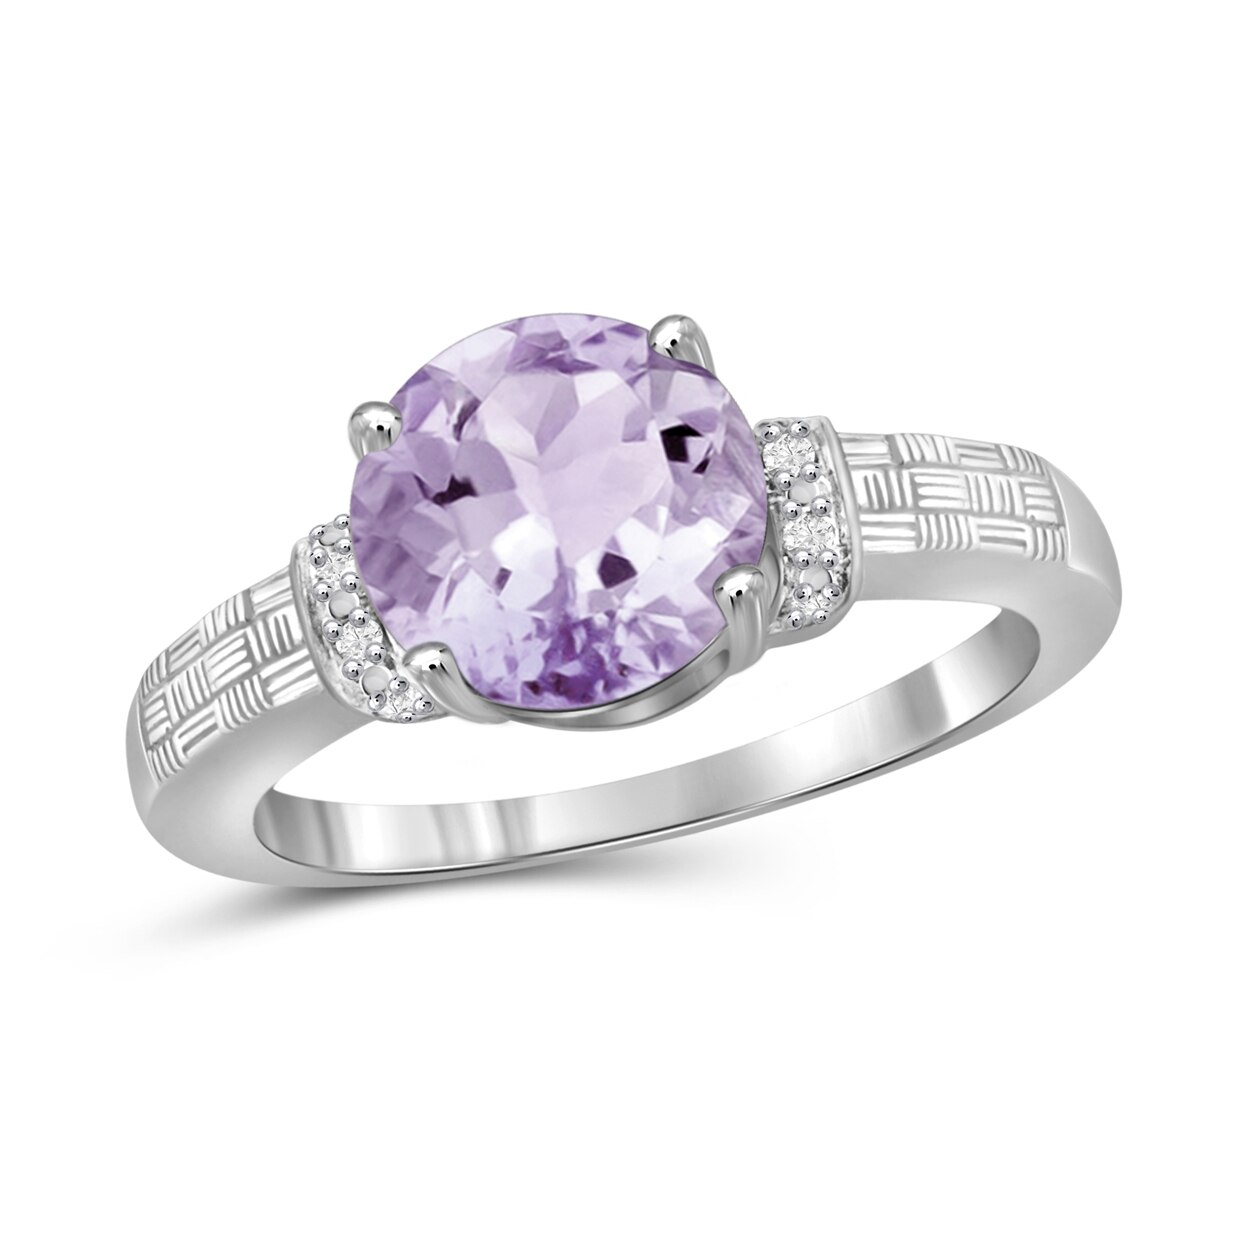 Jewelonfire 1 3/4 карат T. g. w. Розовый фиолетовый камень и акцент белый прозрачный Stone Ring In